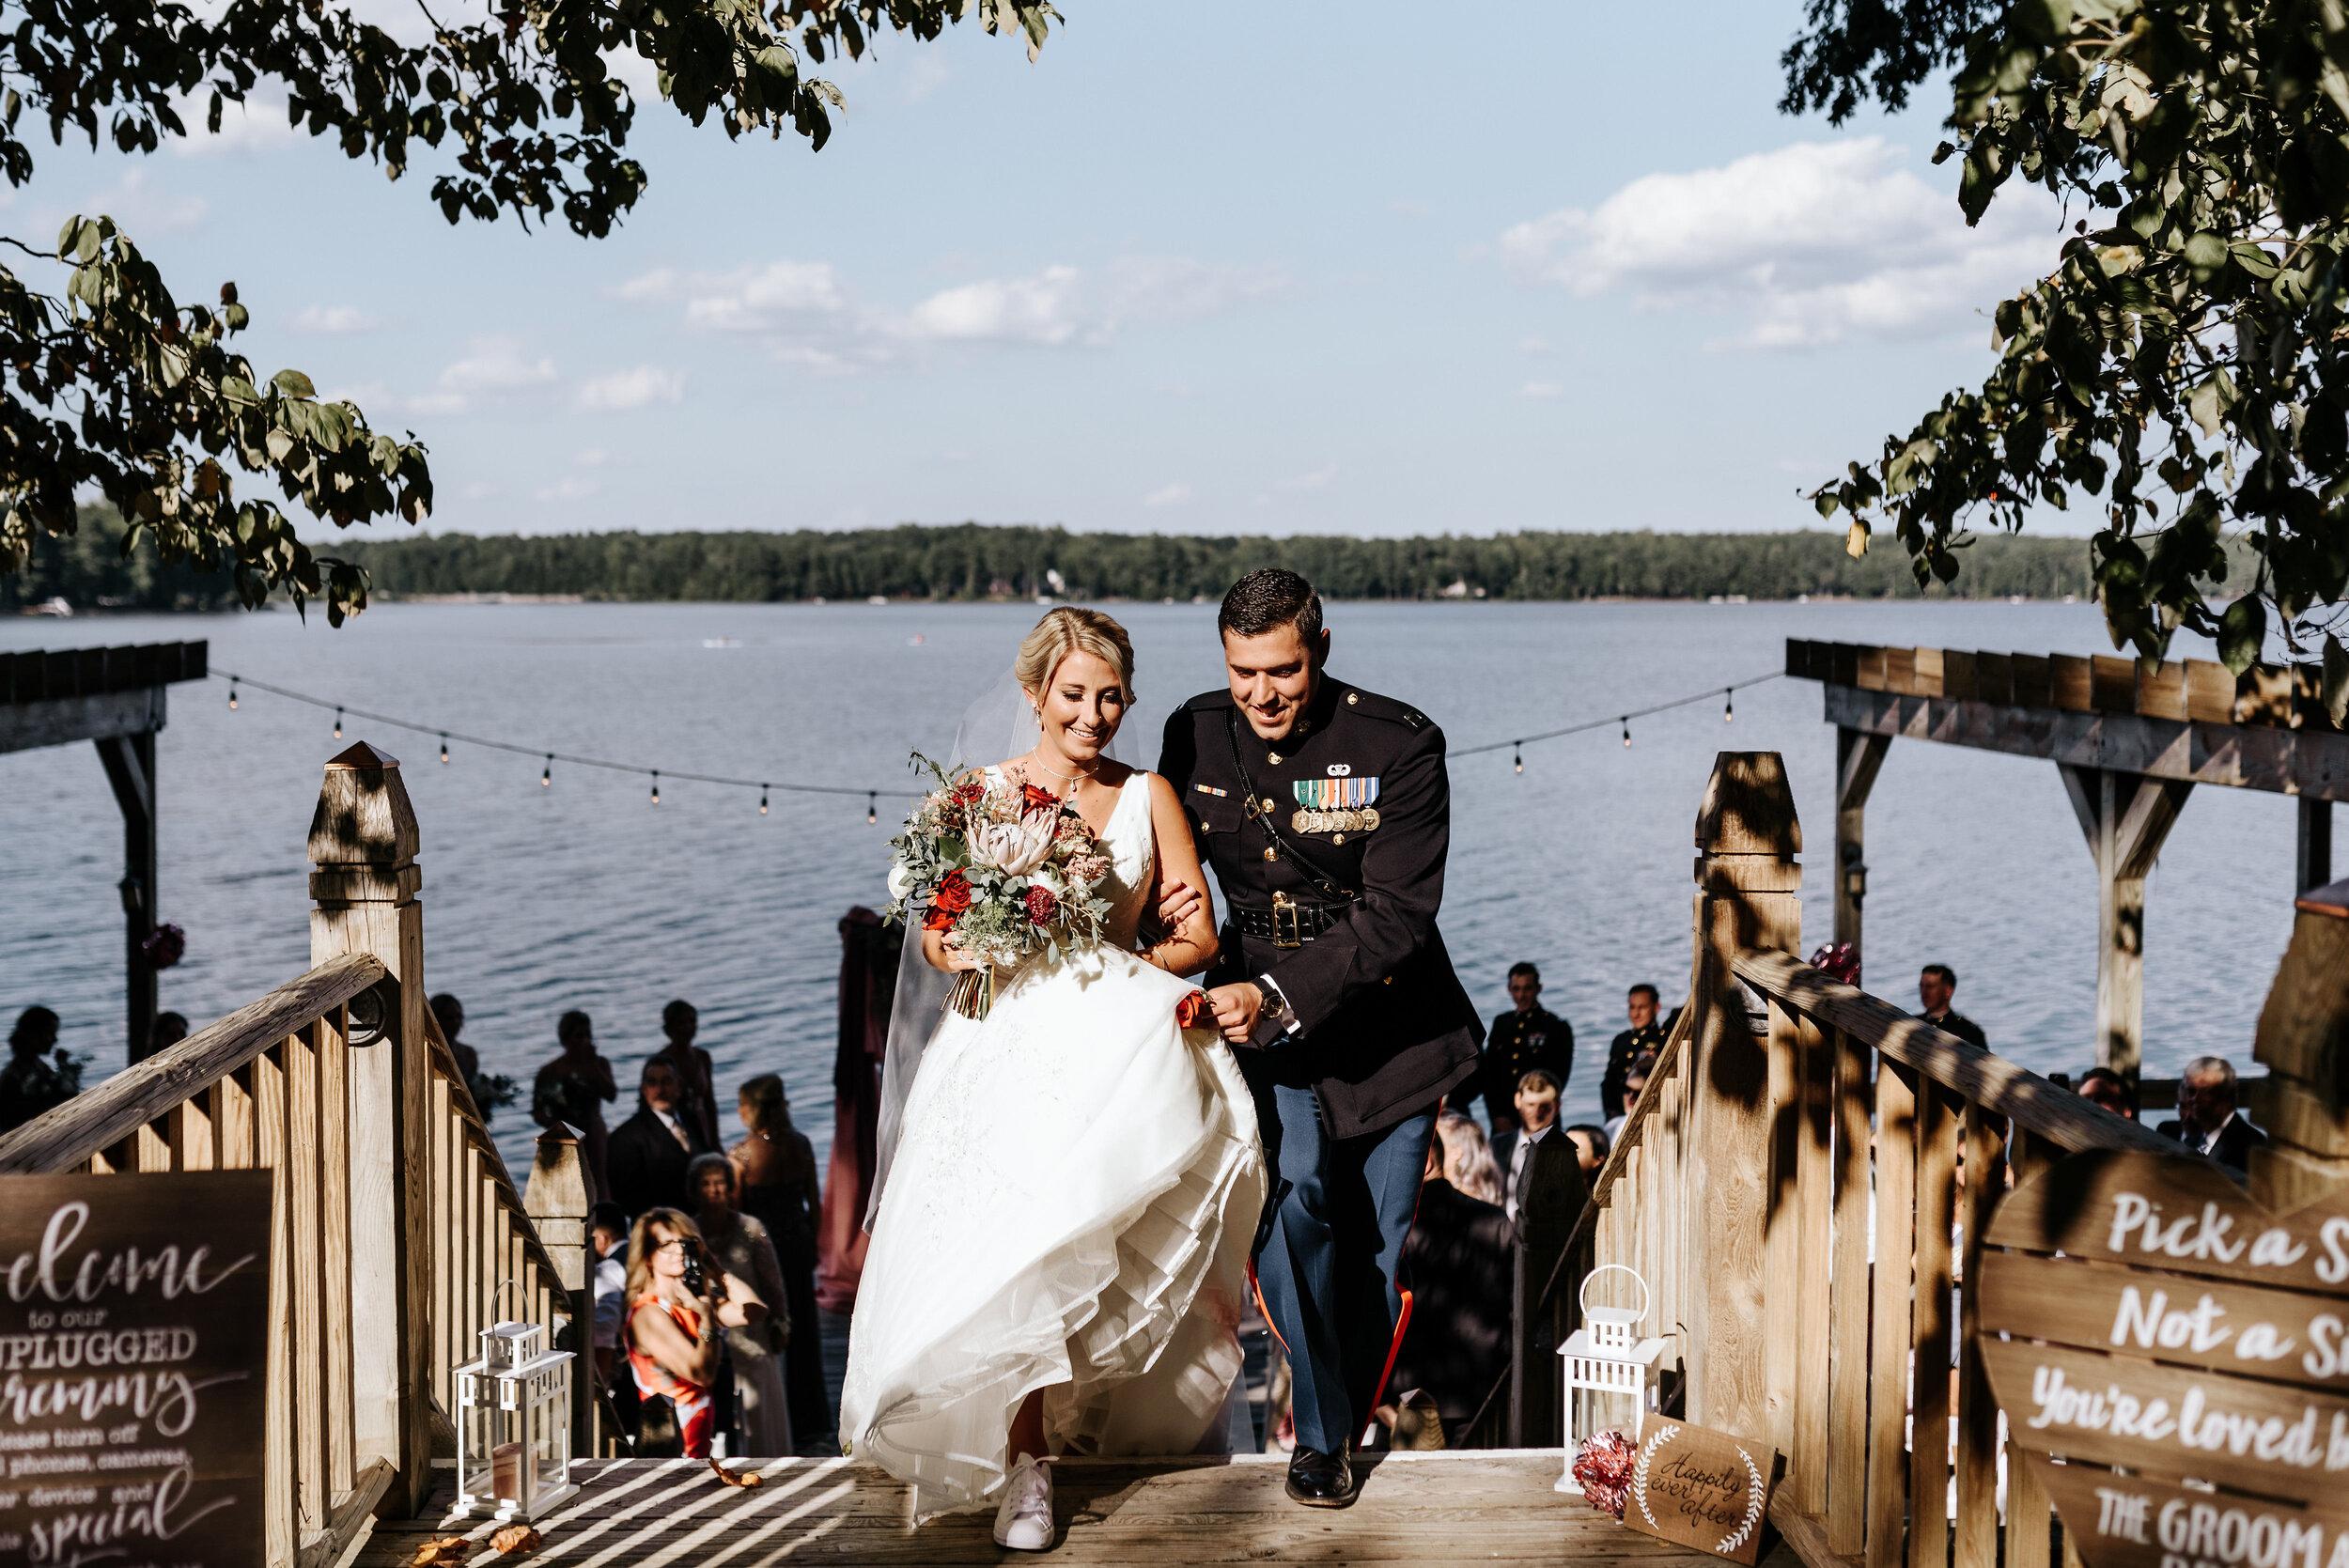 Emily_Mike_Wedding_Celebrations_at_the_Reservoir_Pool_Pavilion_Richmond_Virginia_Wedding_Photographer_Photography_by_V_54.jpg